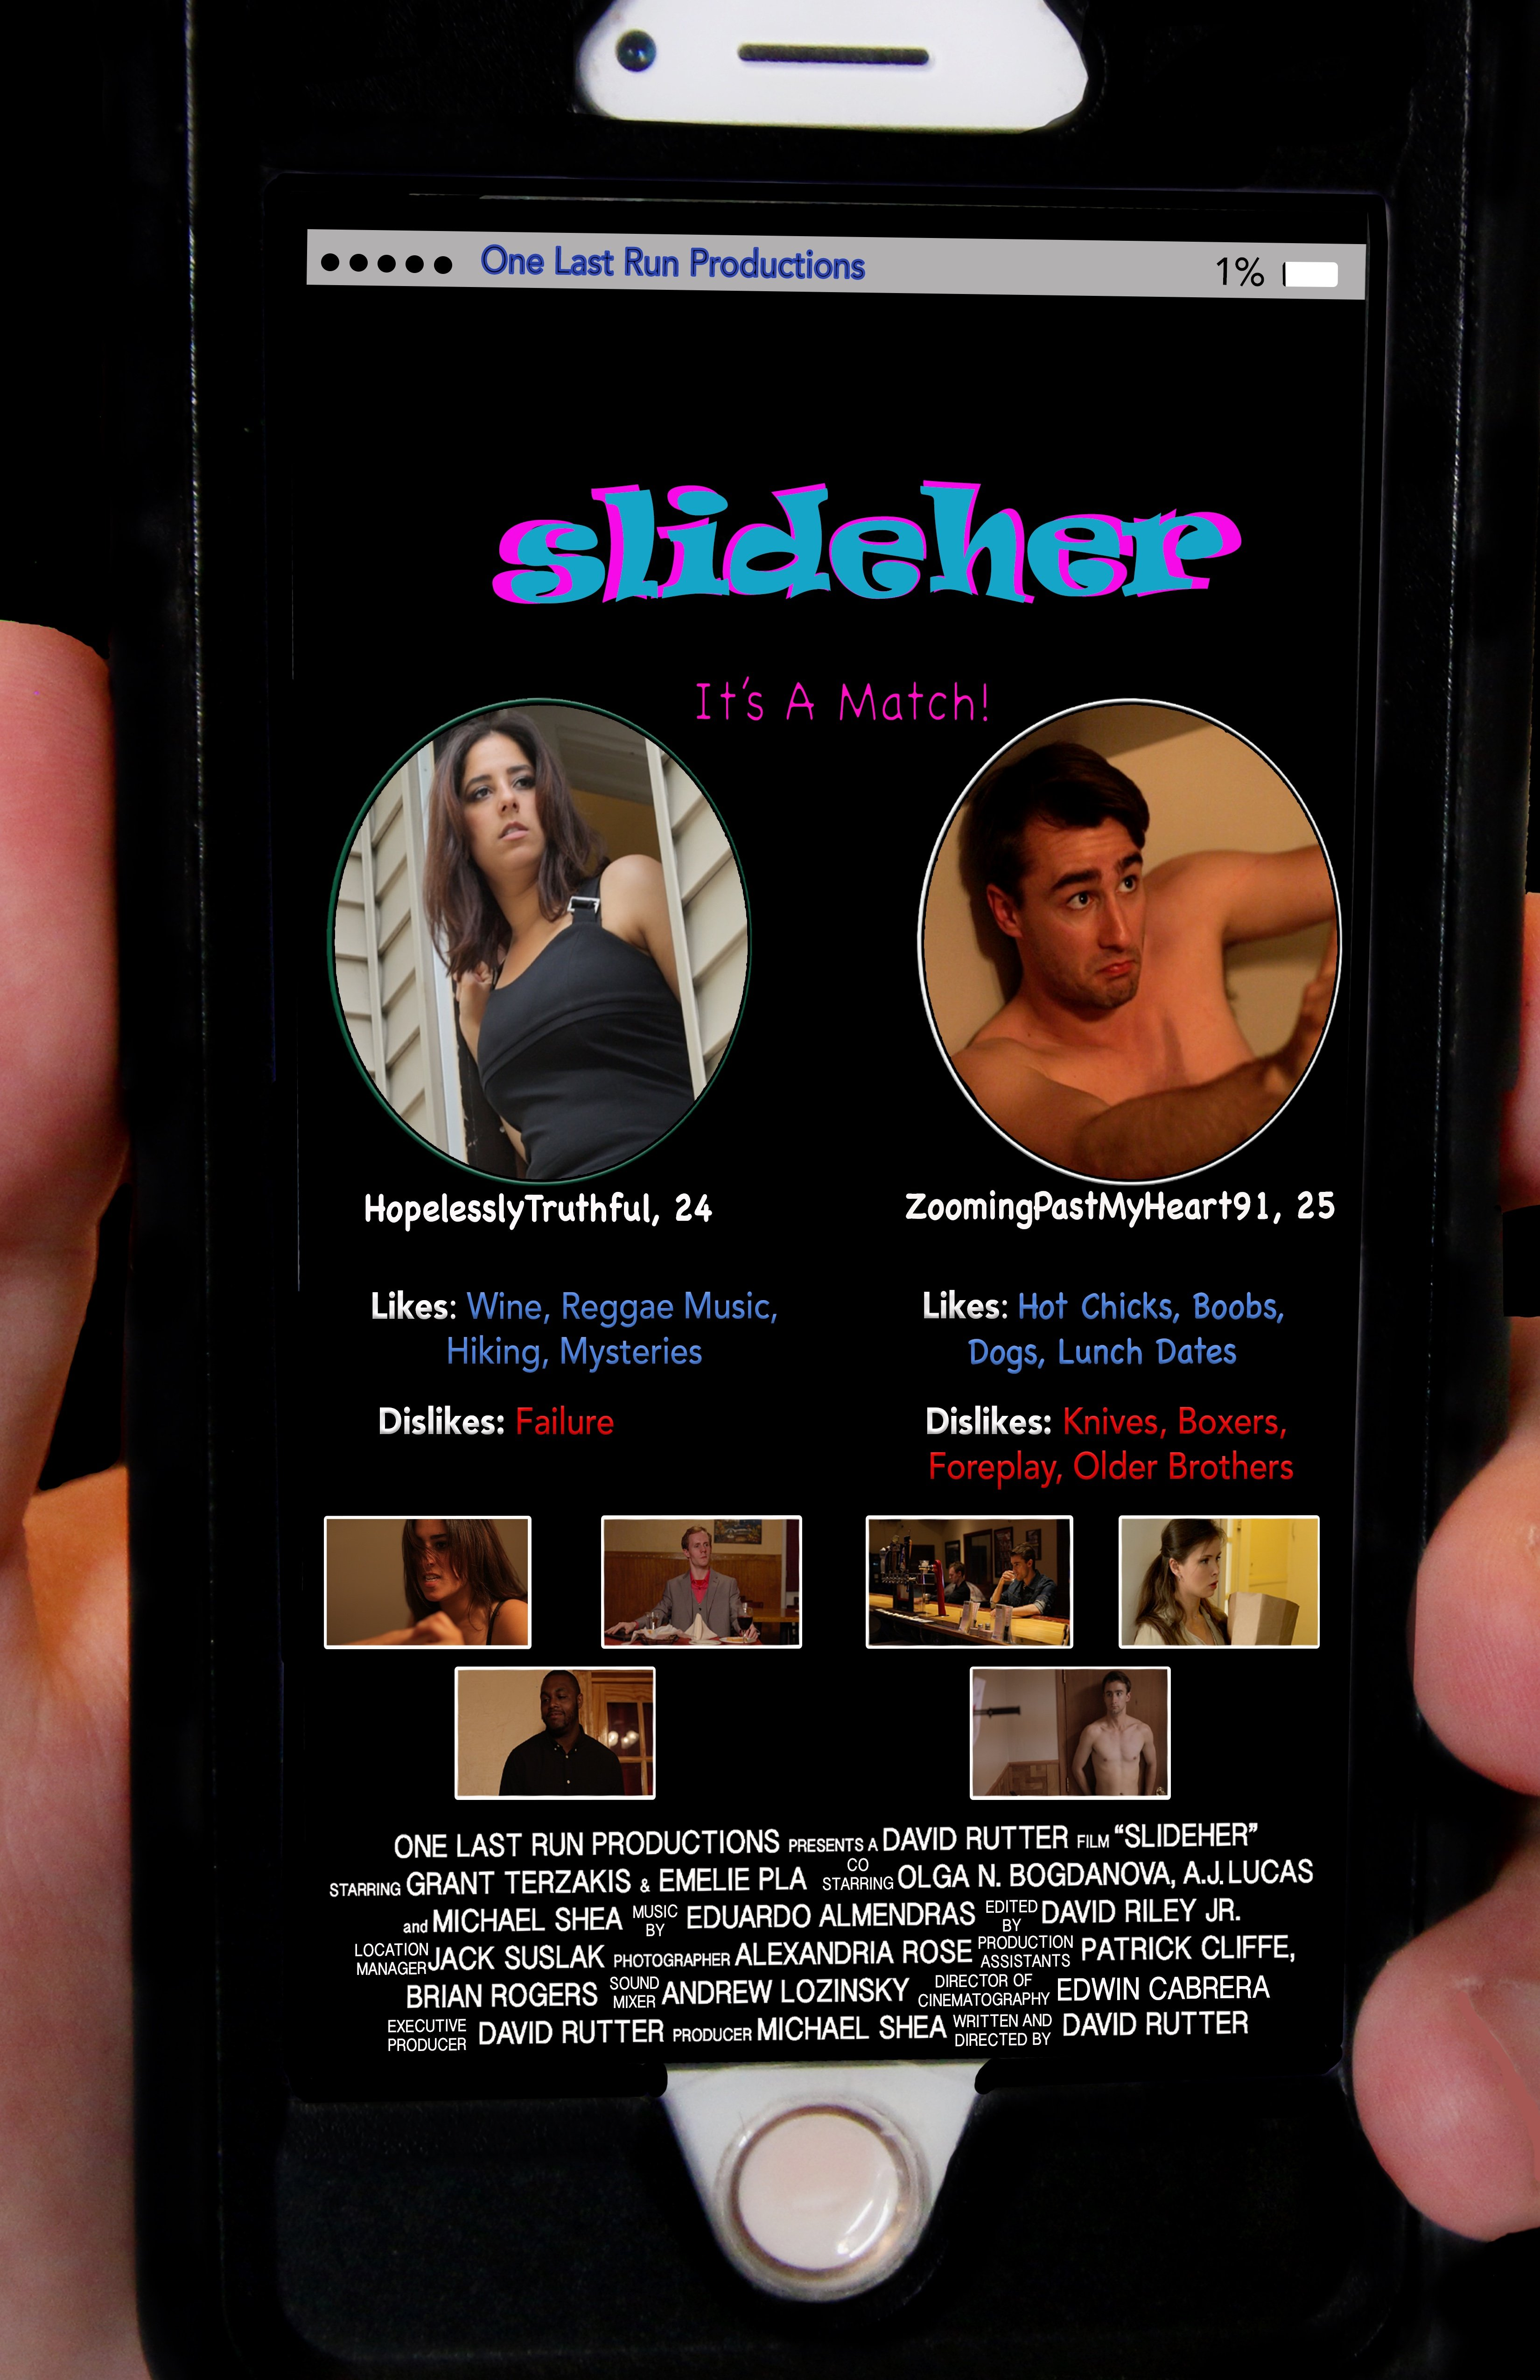 Slideher